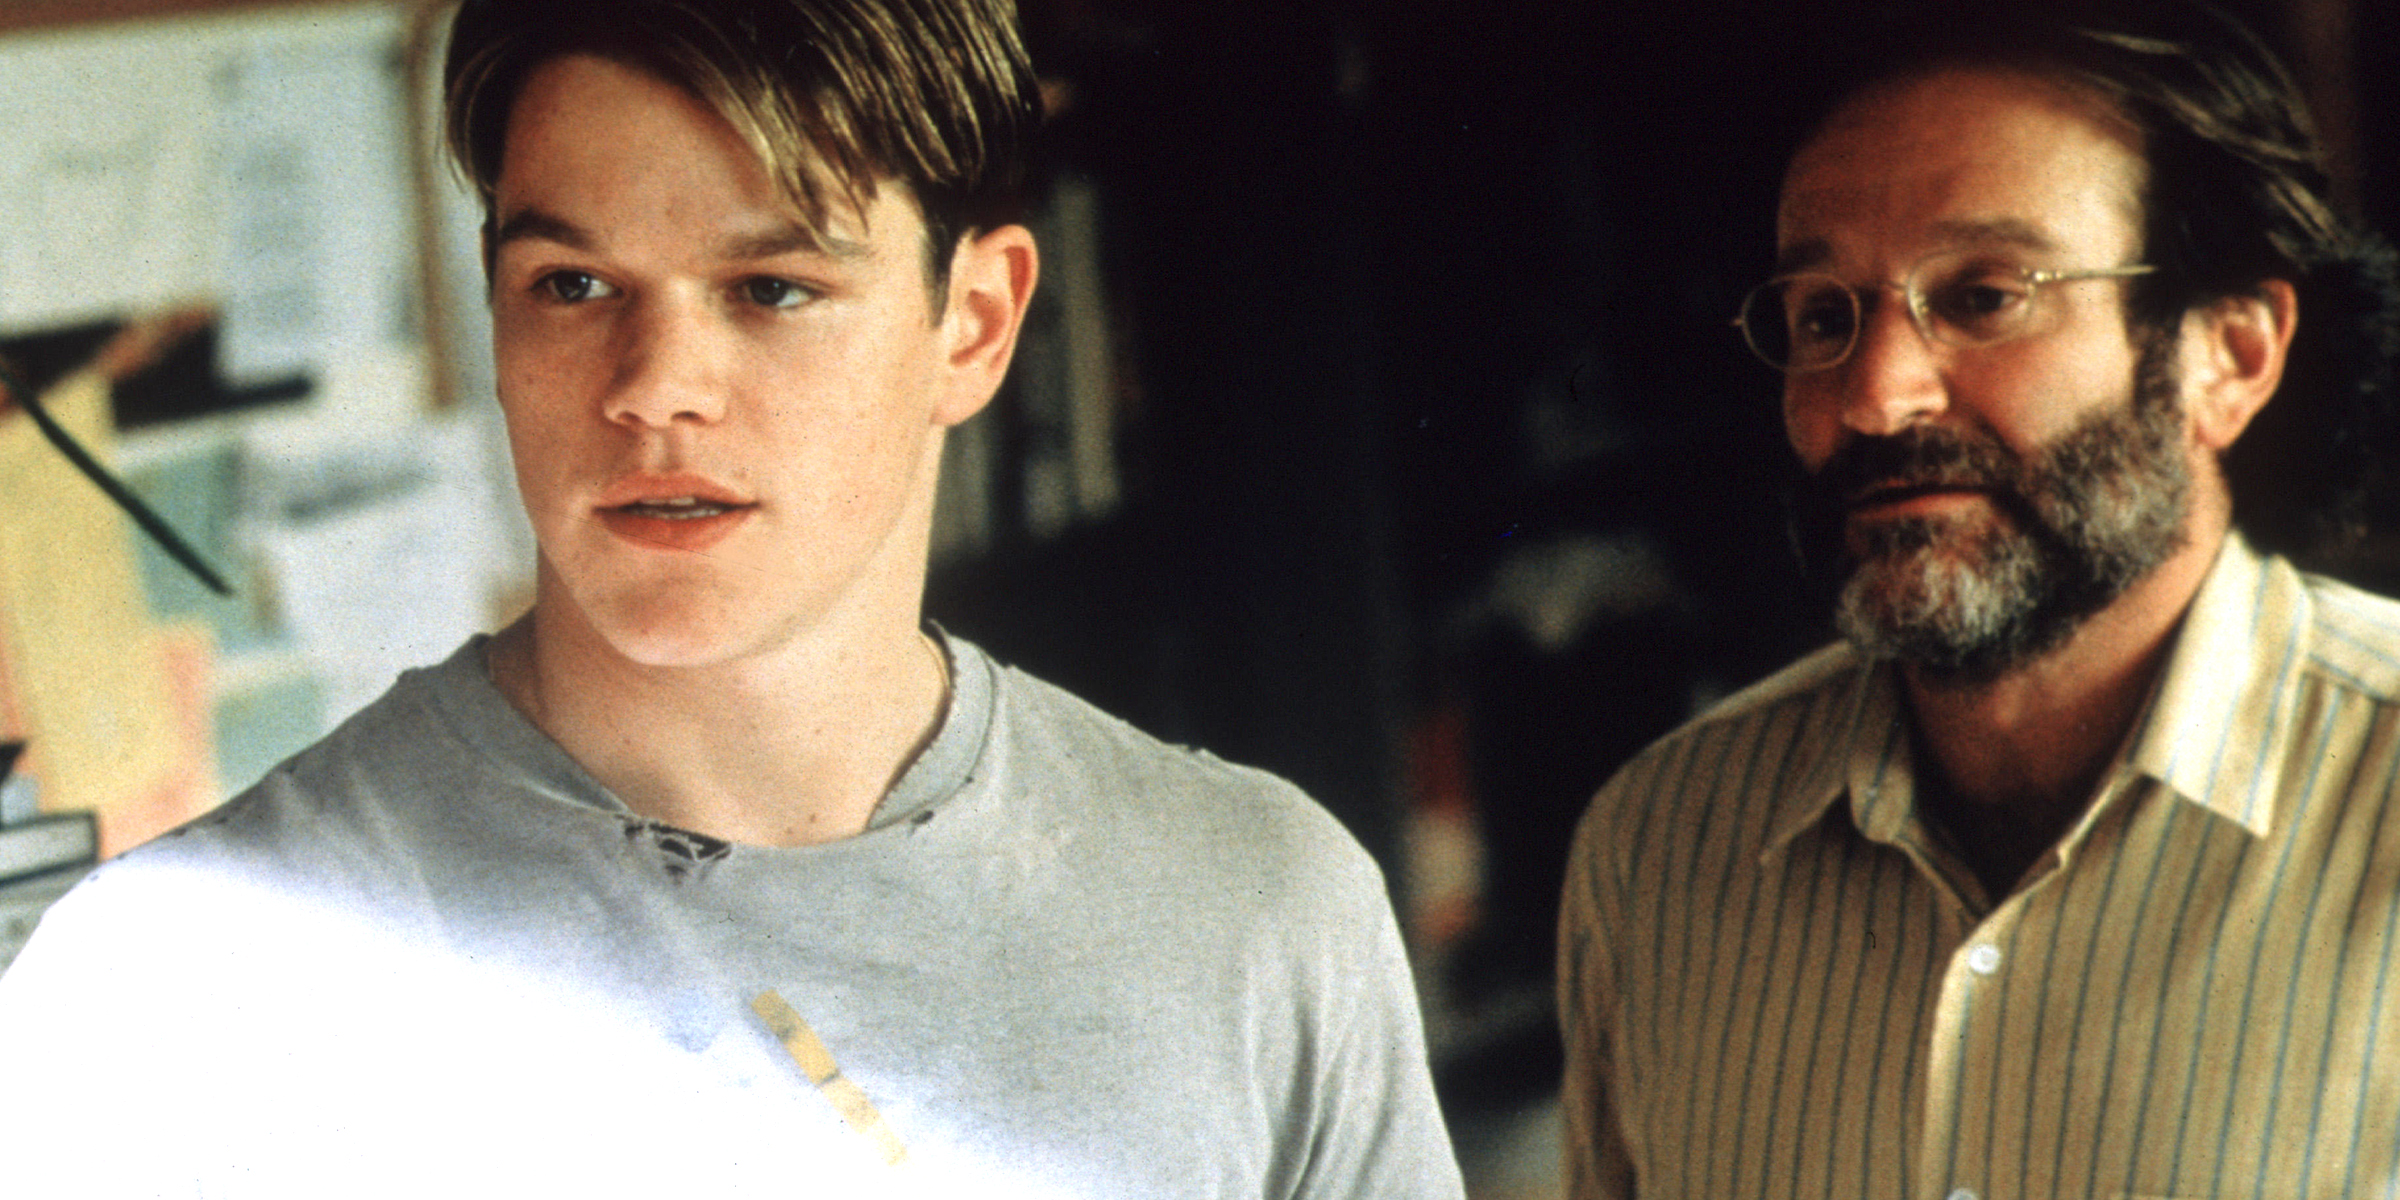 Matt Damon S Kids Have Seen The Martian Refuse To Watch Good